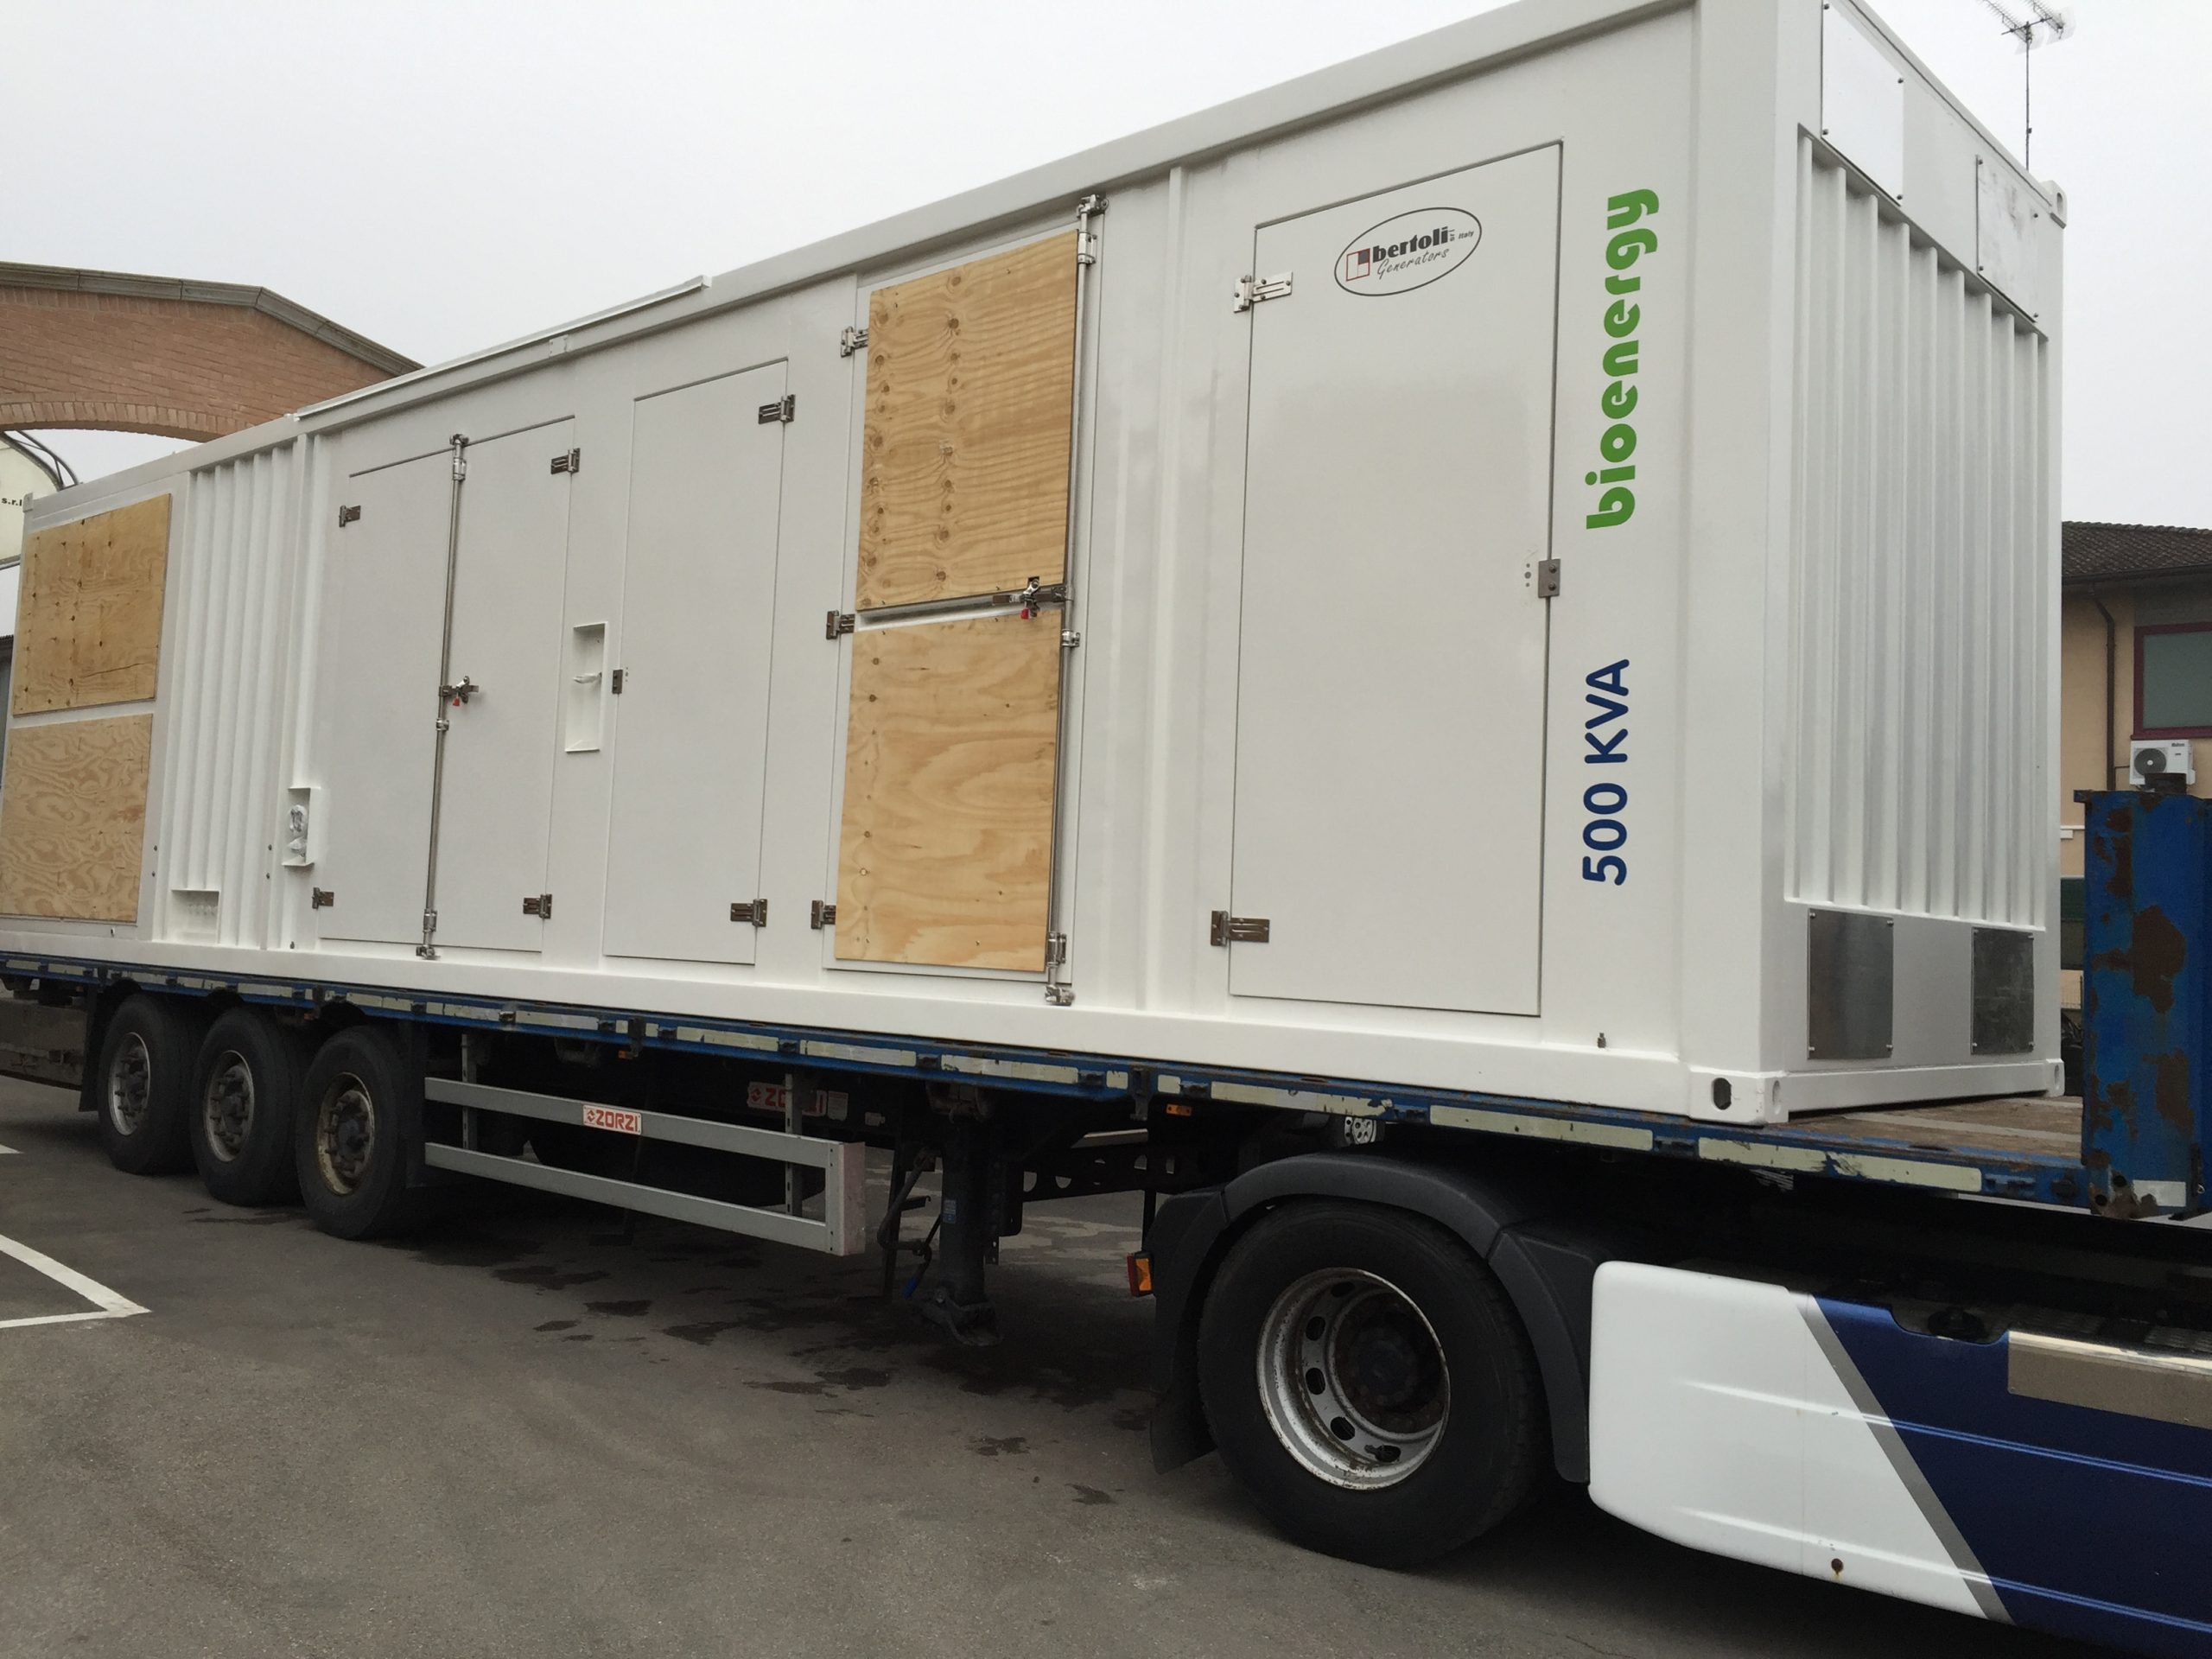 bio-energy generato transportation